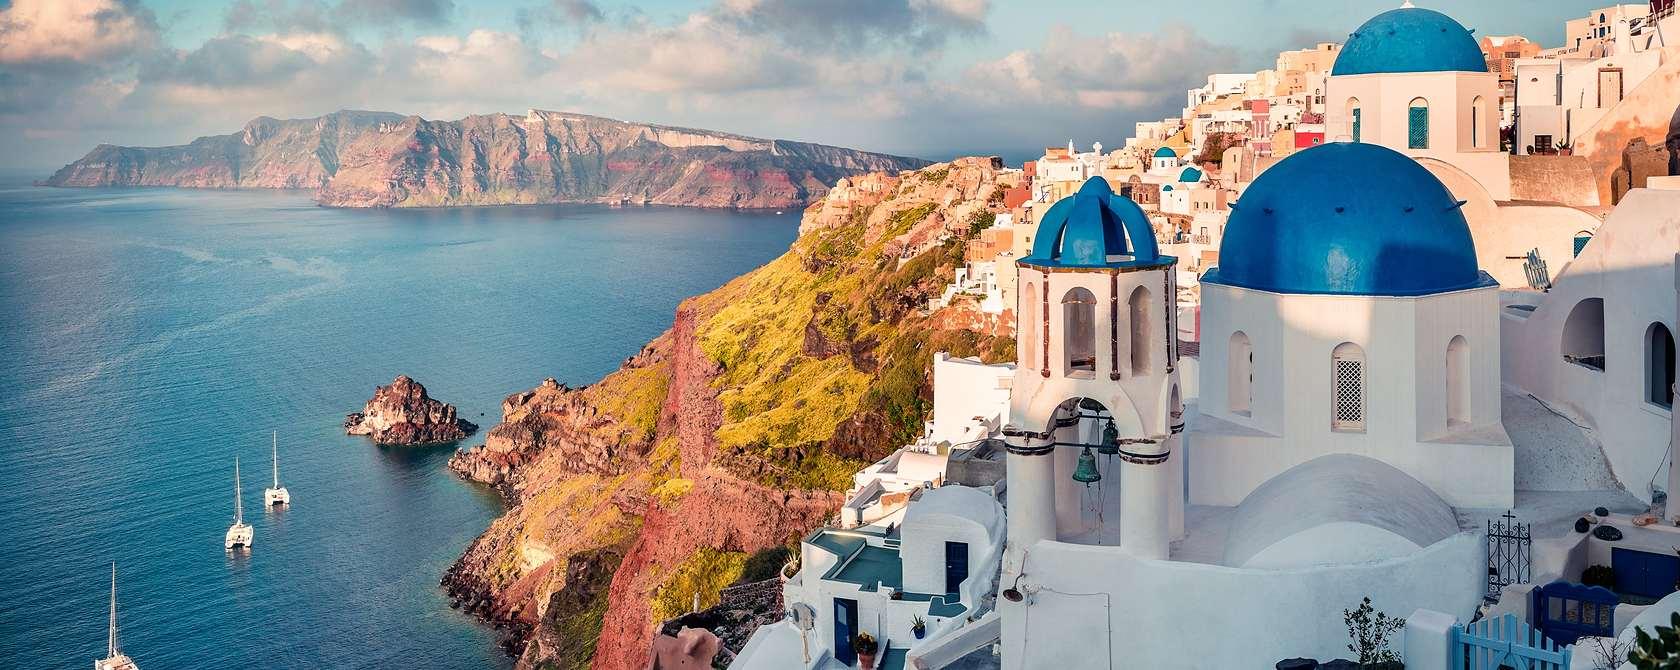 greece-featured-tour-photo-santorini-1680x670